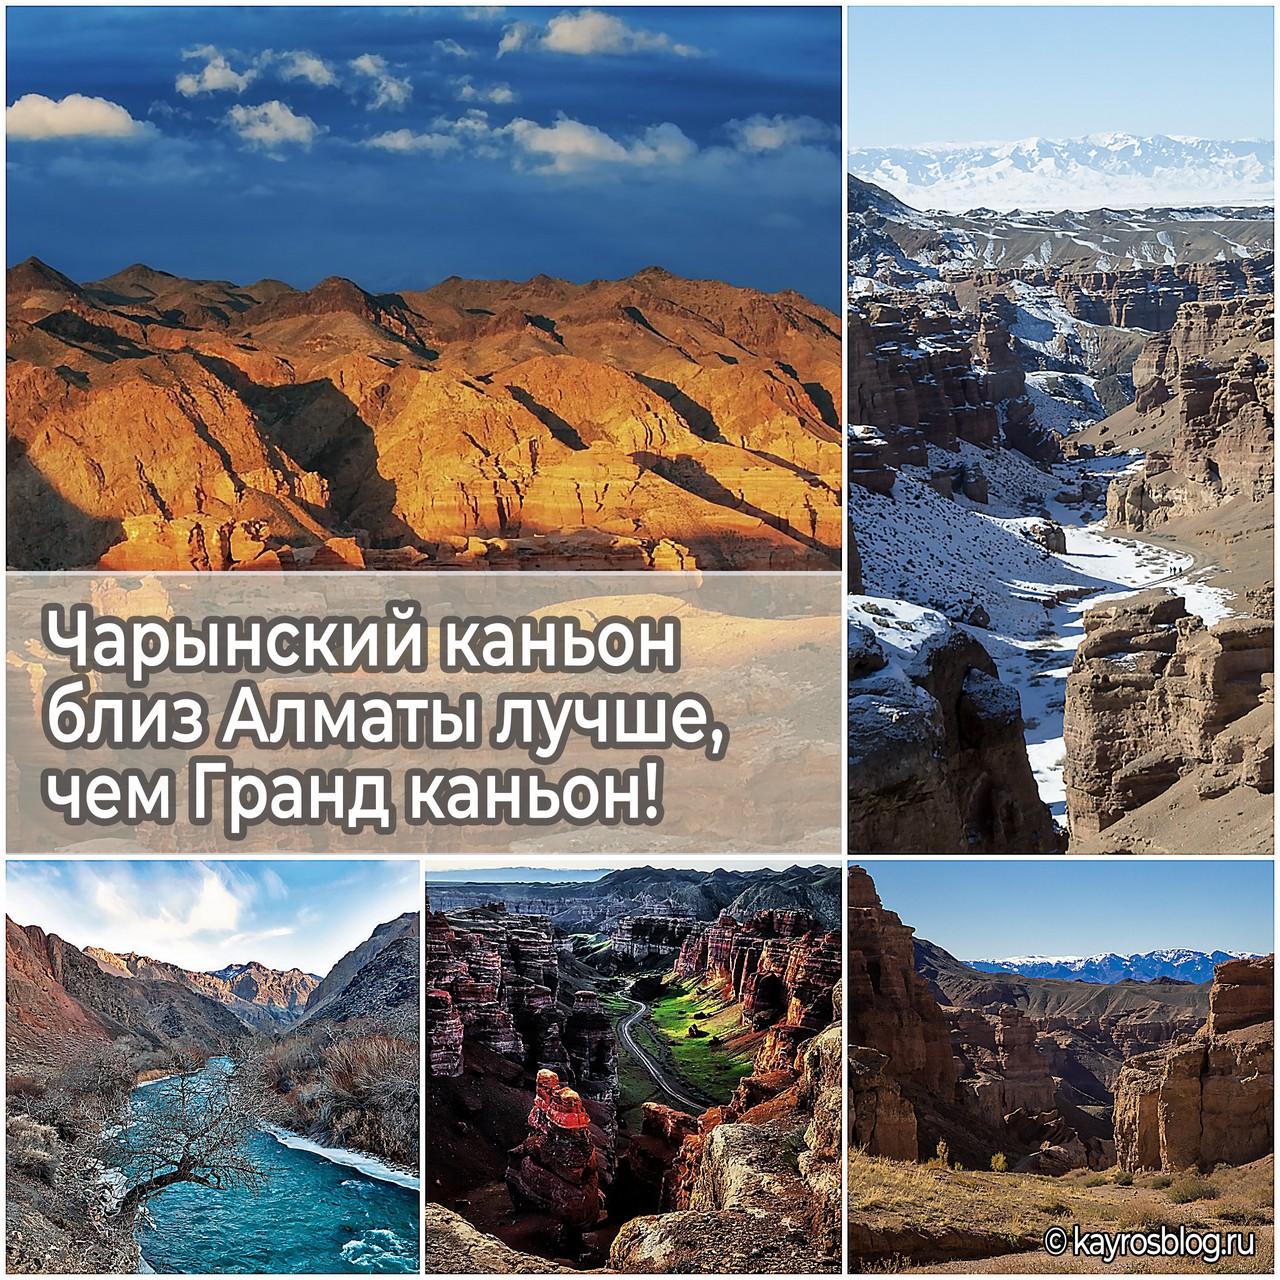 Чарынский каньон близ Алматы лучше, чем Гранд каньон